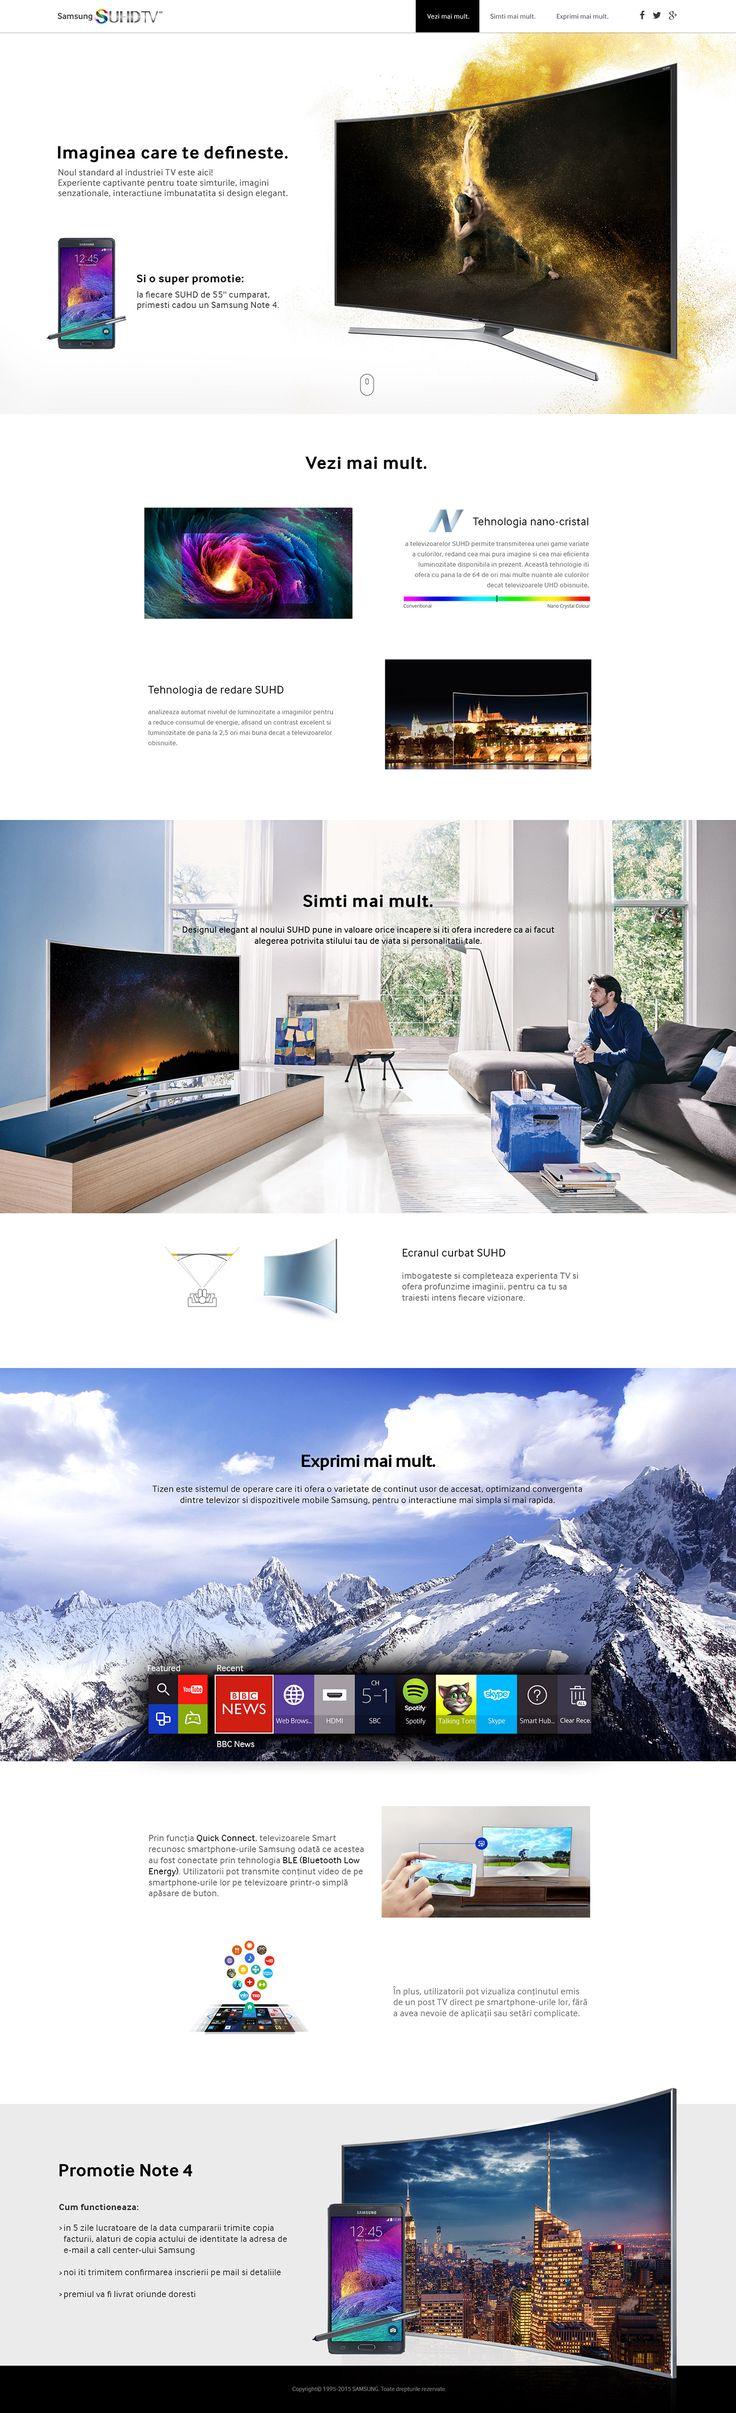 Samsung SUHD TV microsite on Behance